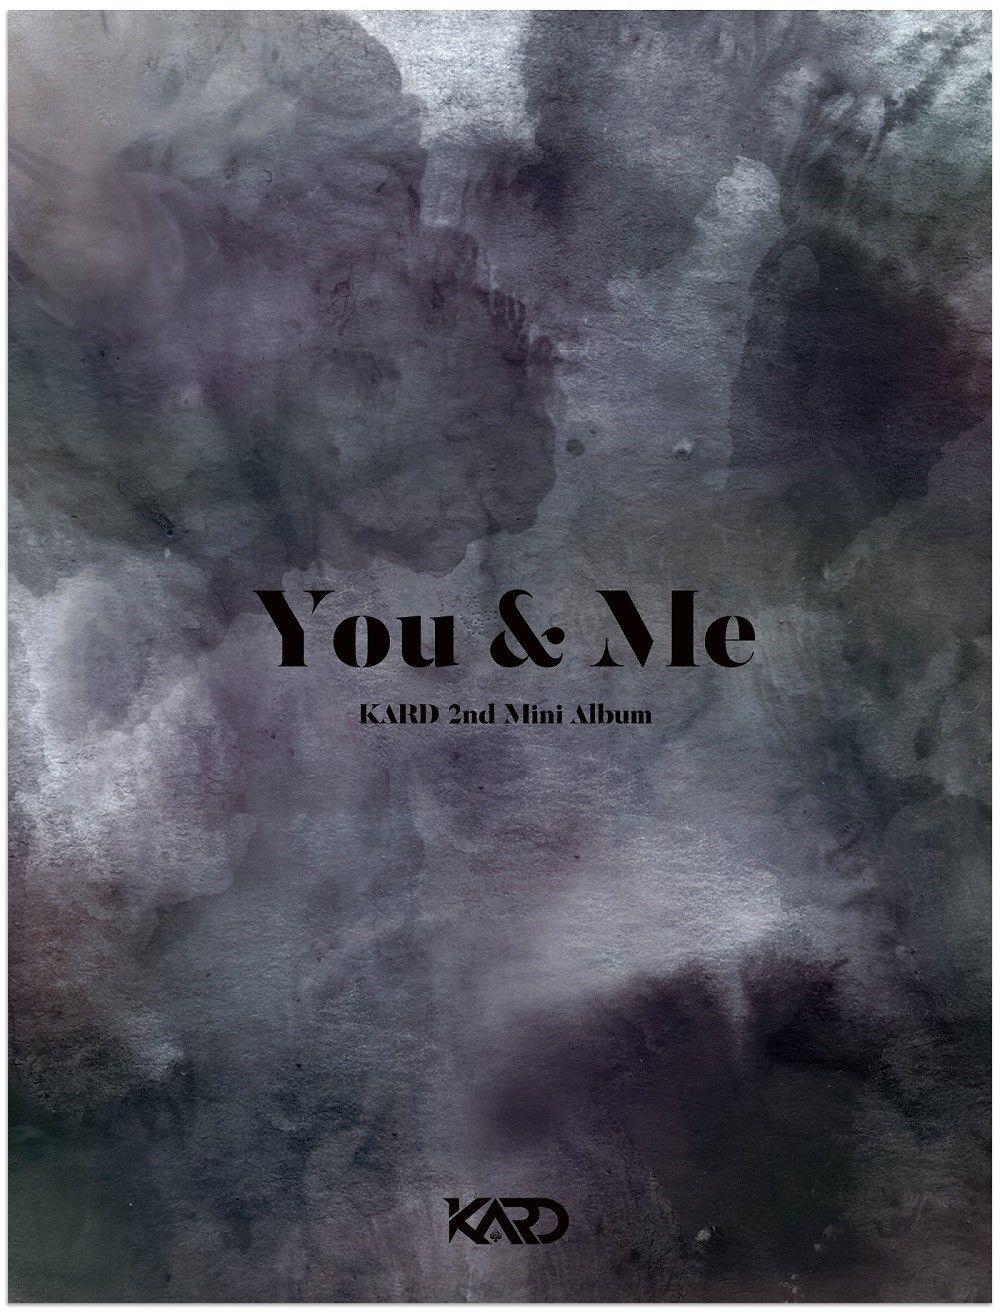 все цены на KARD - YOU & ME (2nd Mini Album) - Release Date 2017.11.22